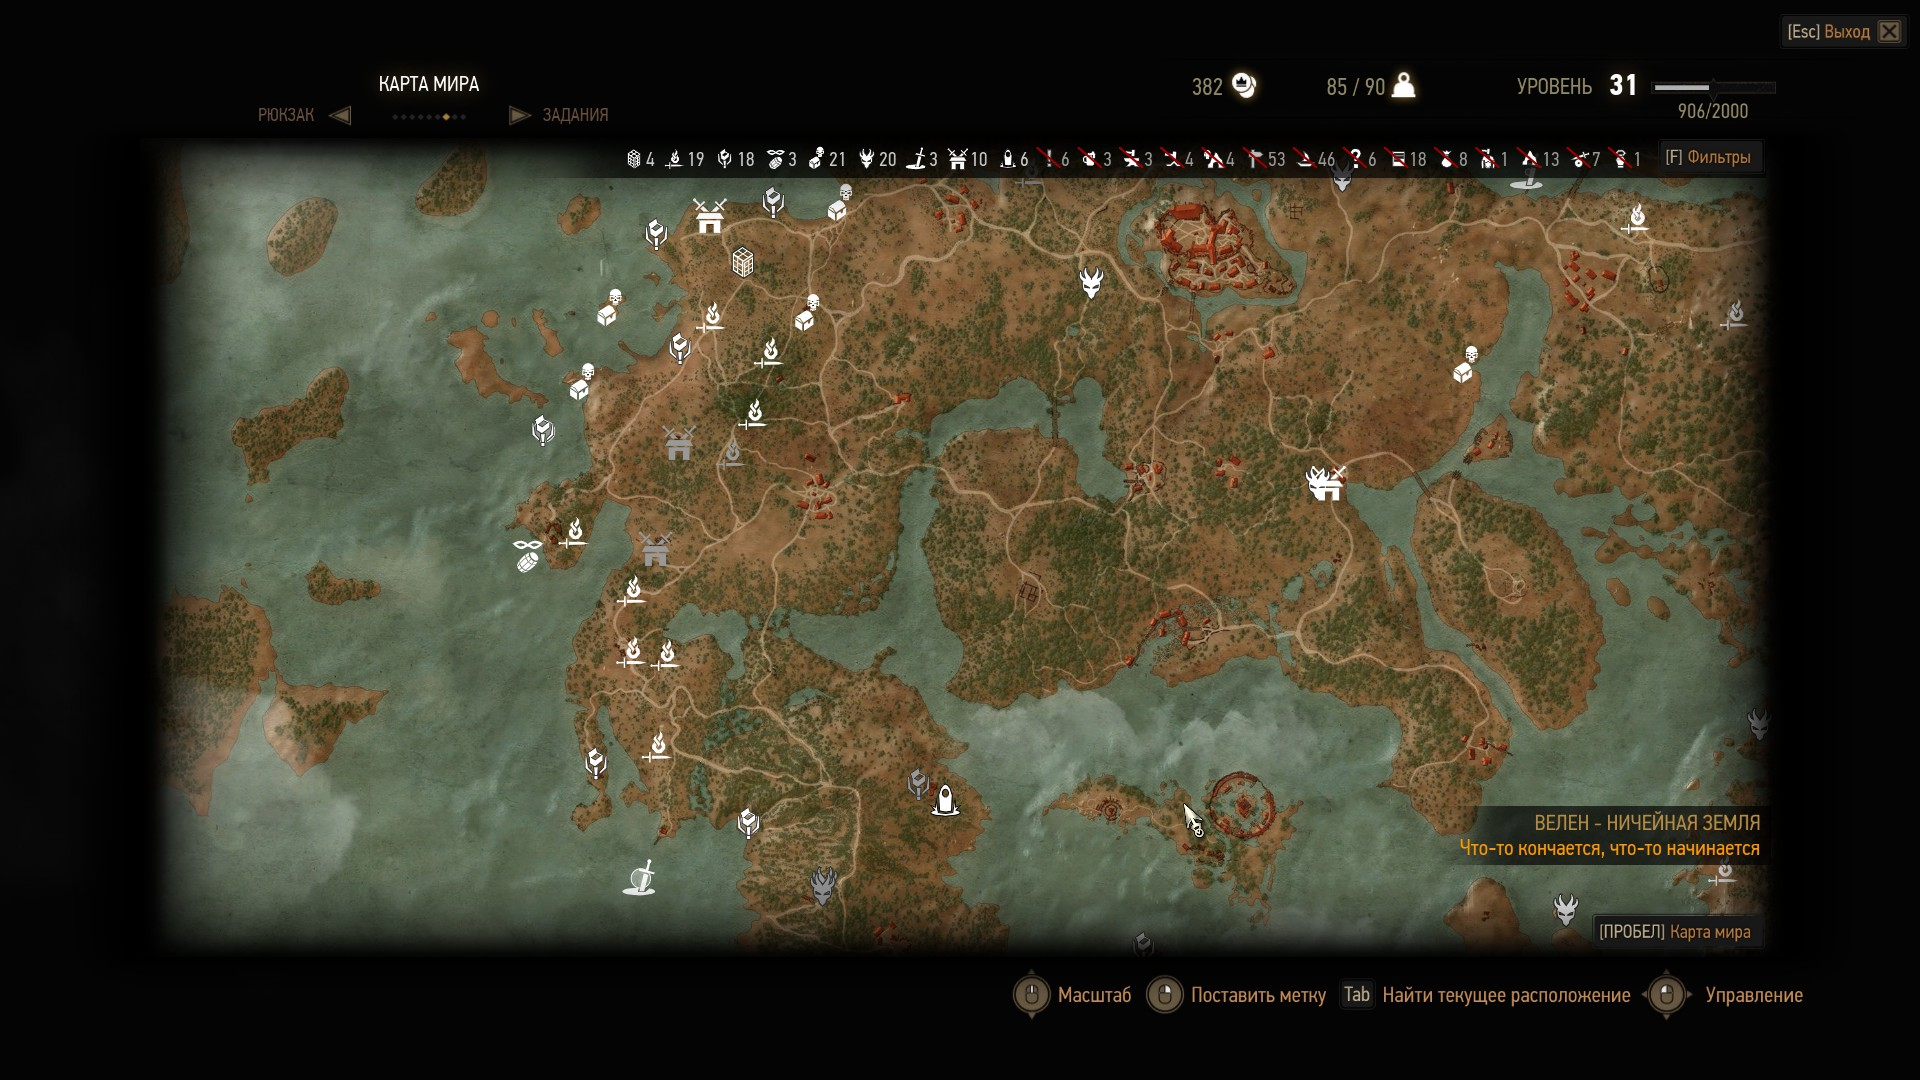 http://www.gamer.ru/system/attached_images/images/000/700/372/original/2015-06-12_00003.jpg